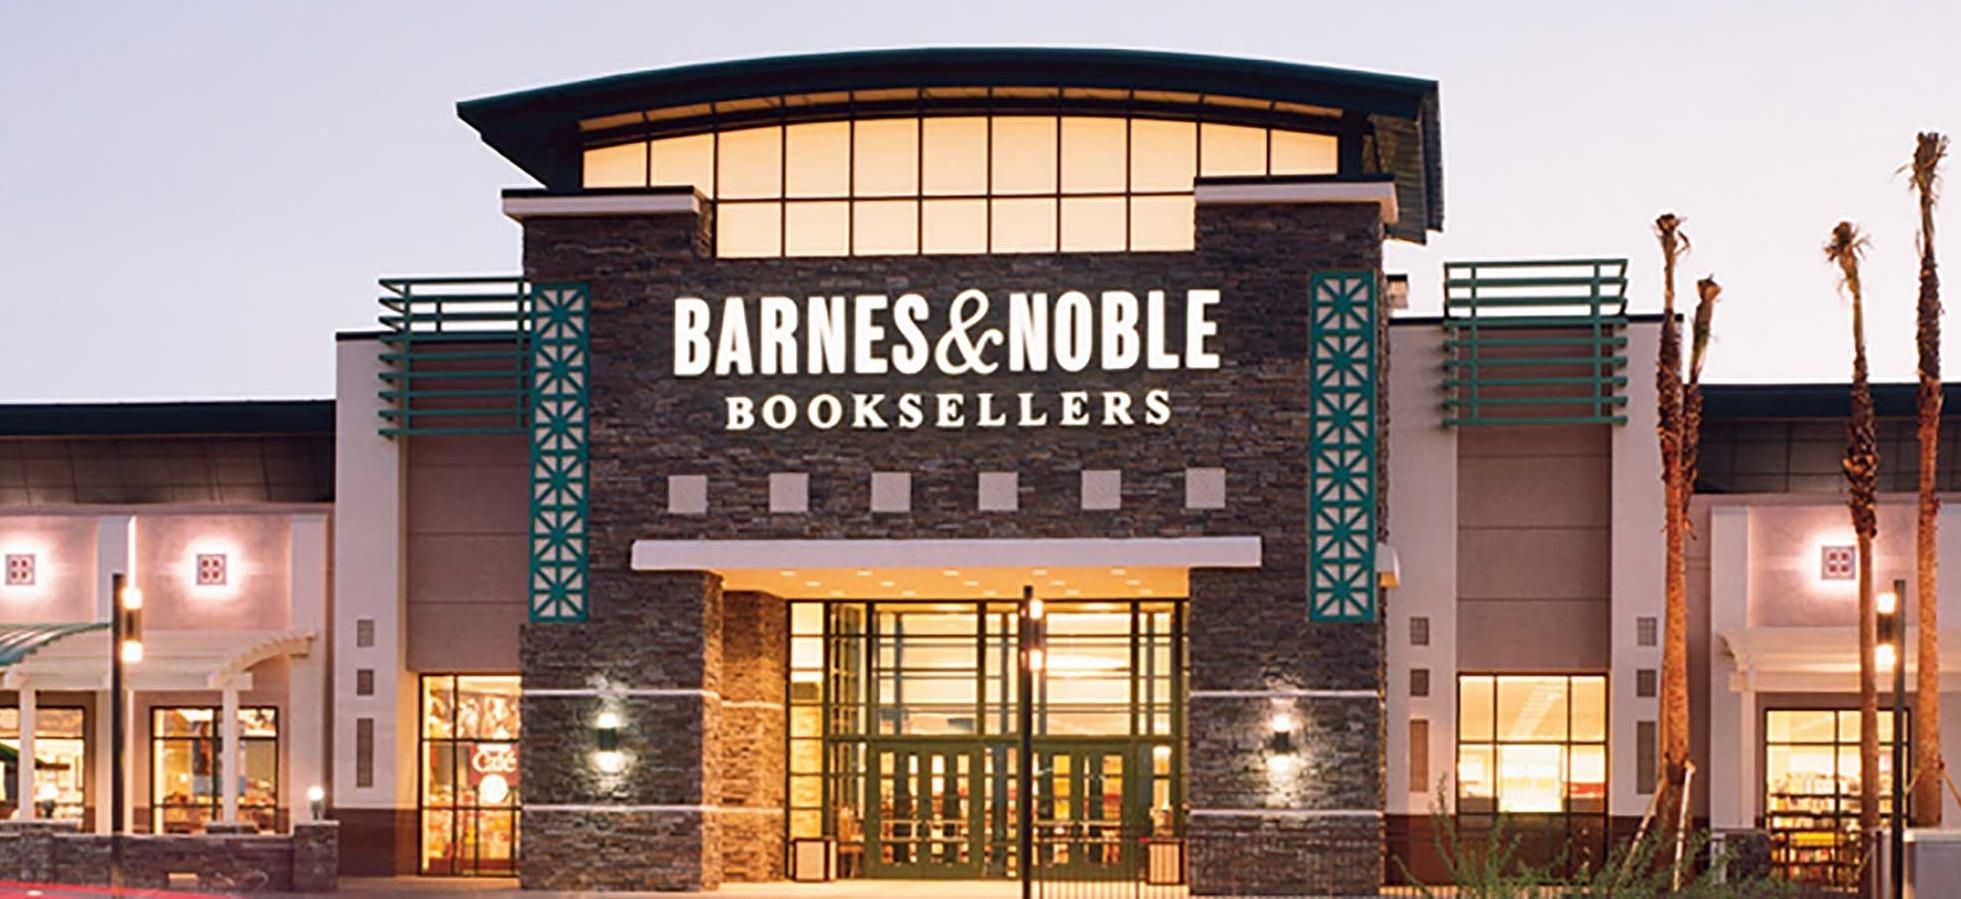 Exterior of Barnes & Noble store